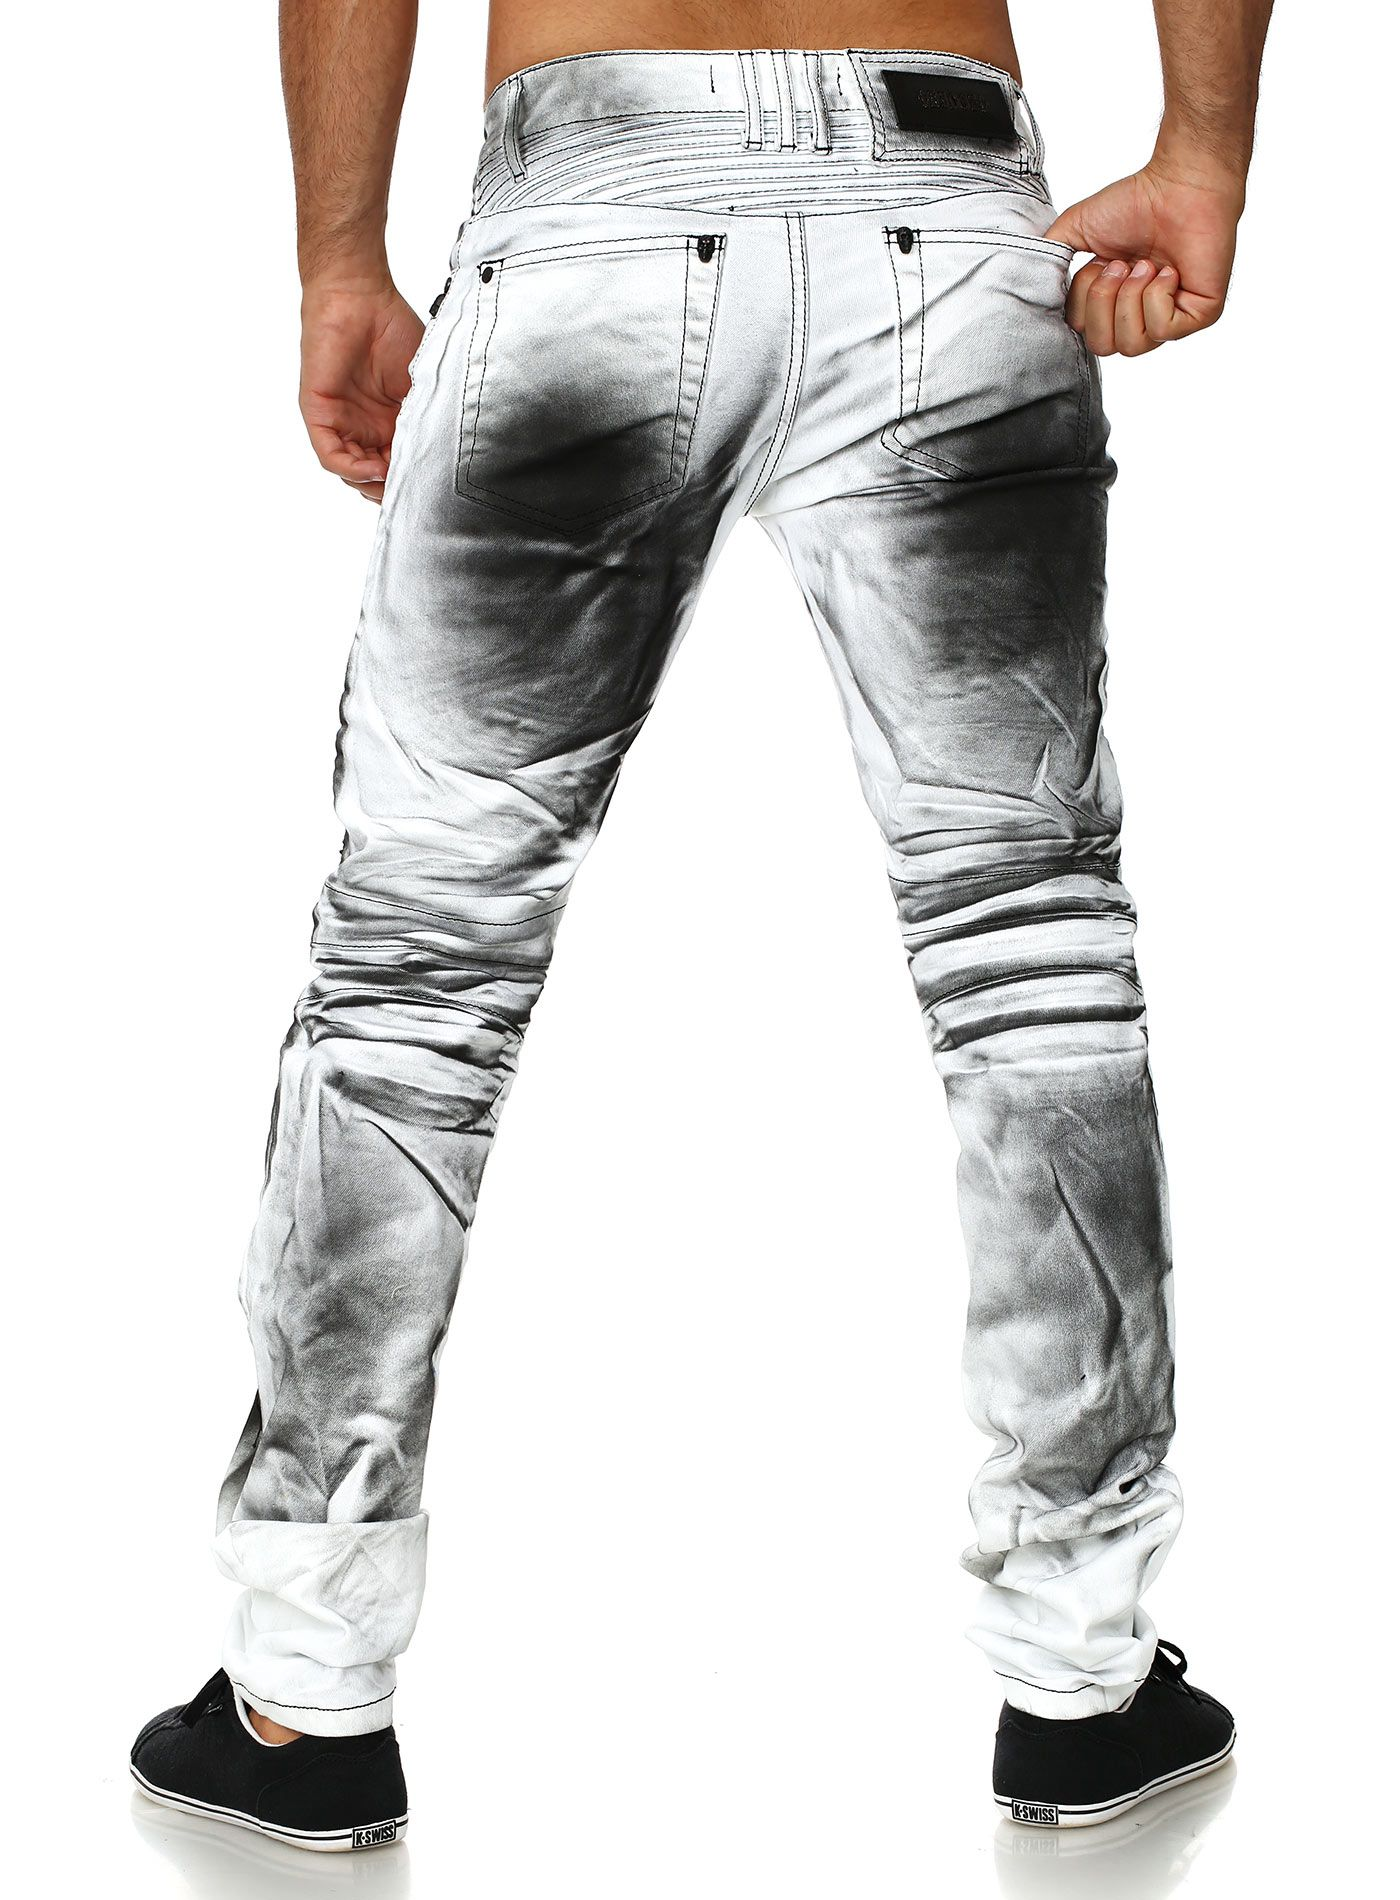 01d7f8c9 Kingz Jeans Vintage Look white | Fashion for me | Denim pants mens ...